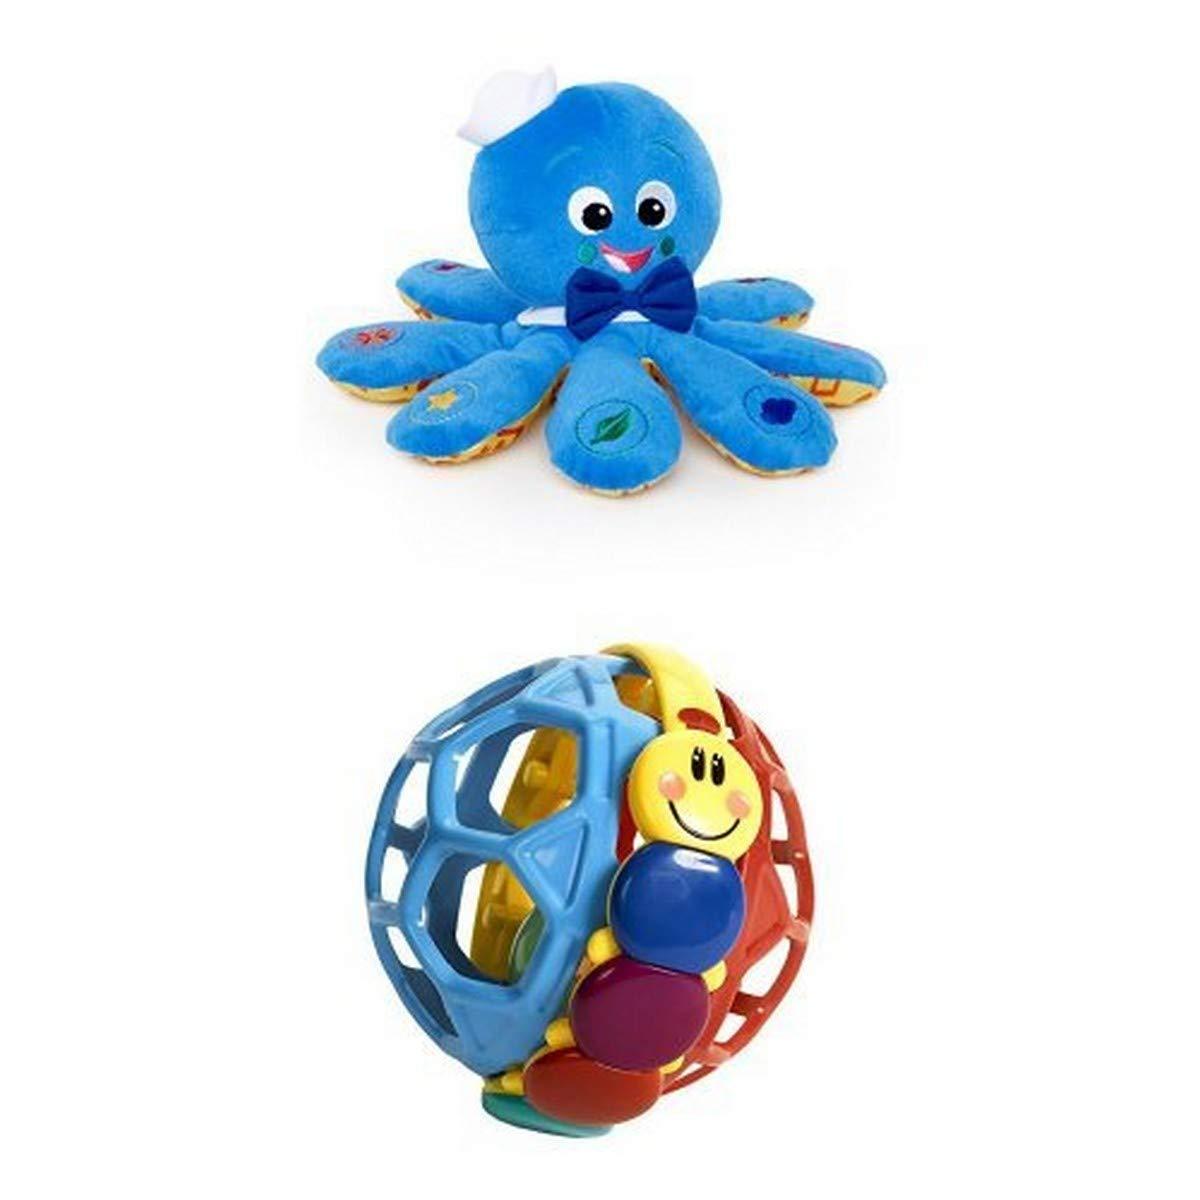 Octoplush Plush Toy + Bendy Ball